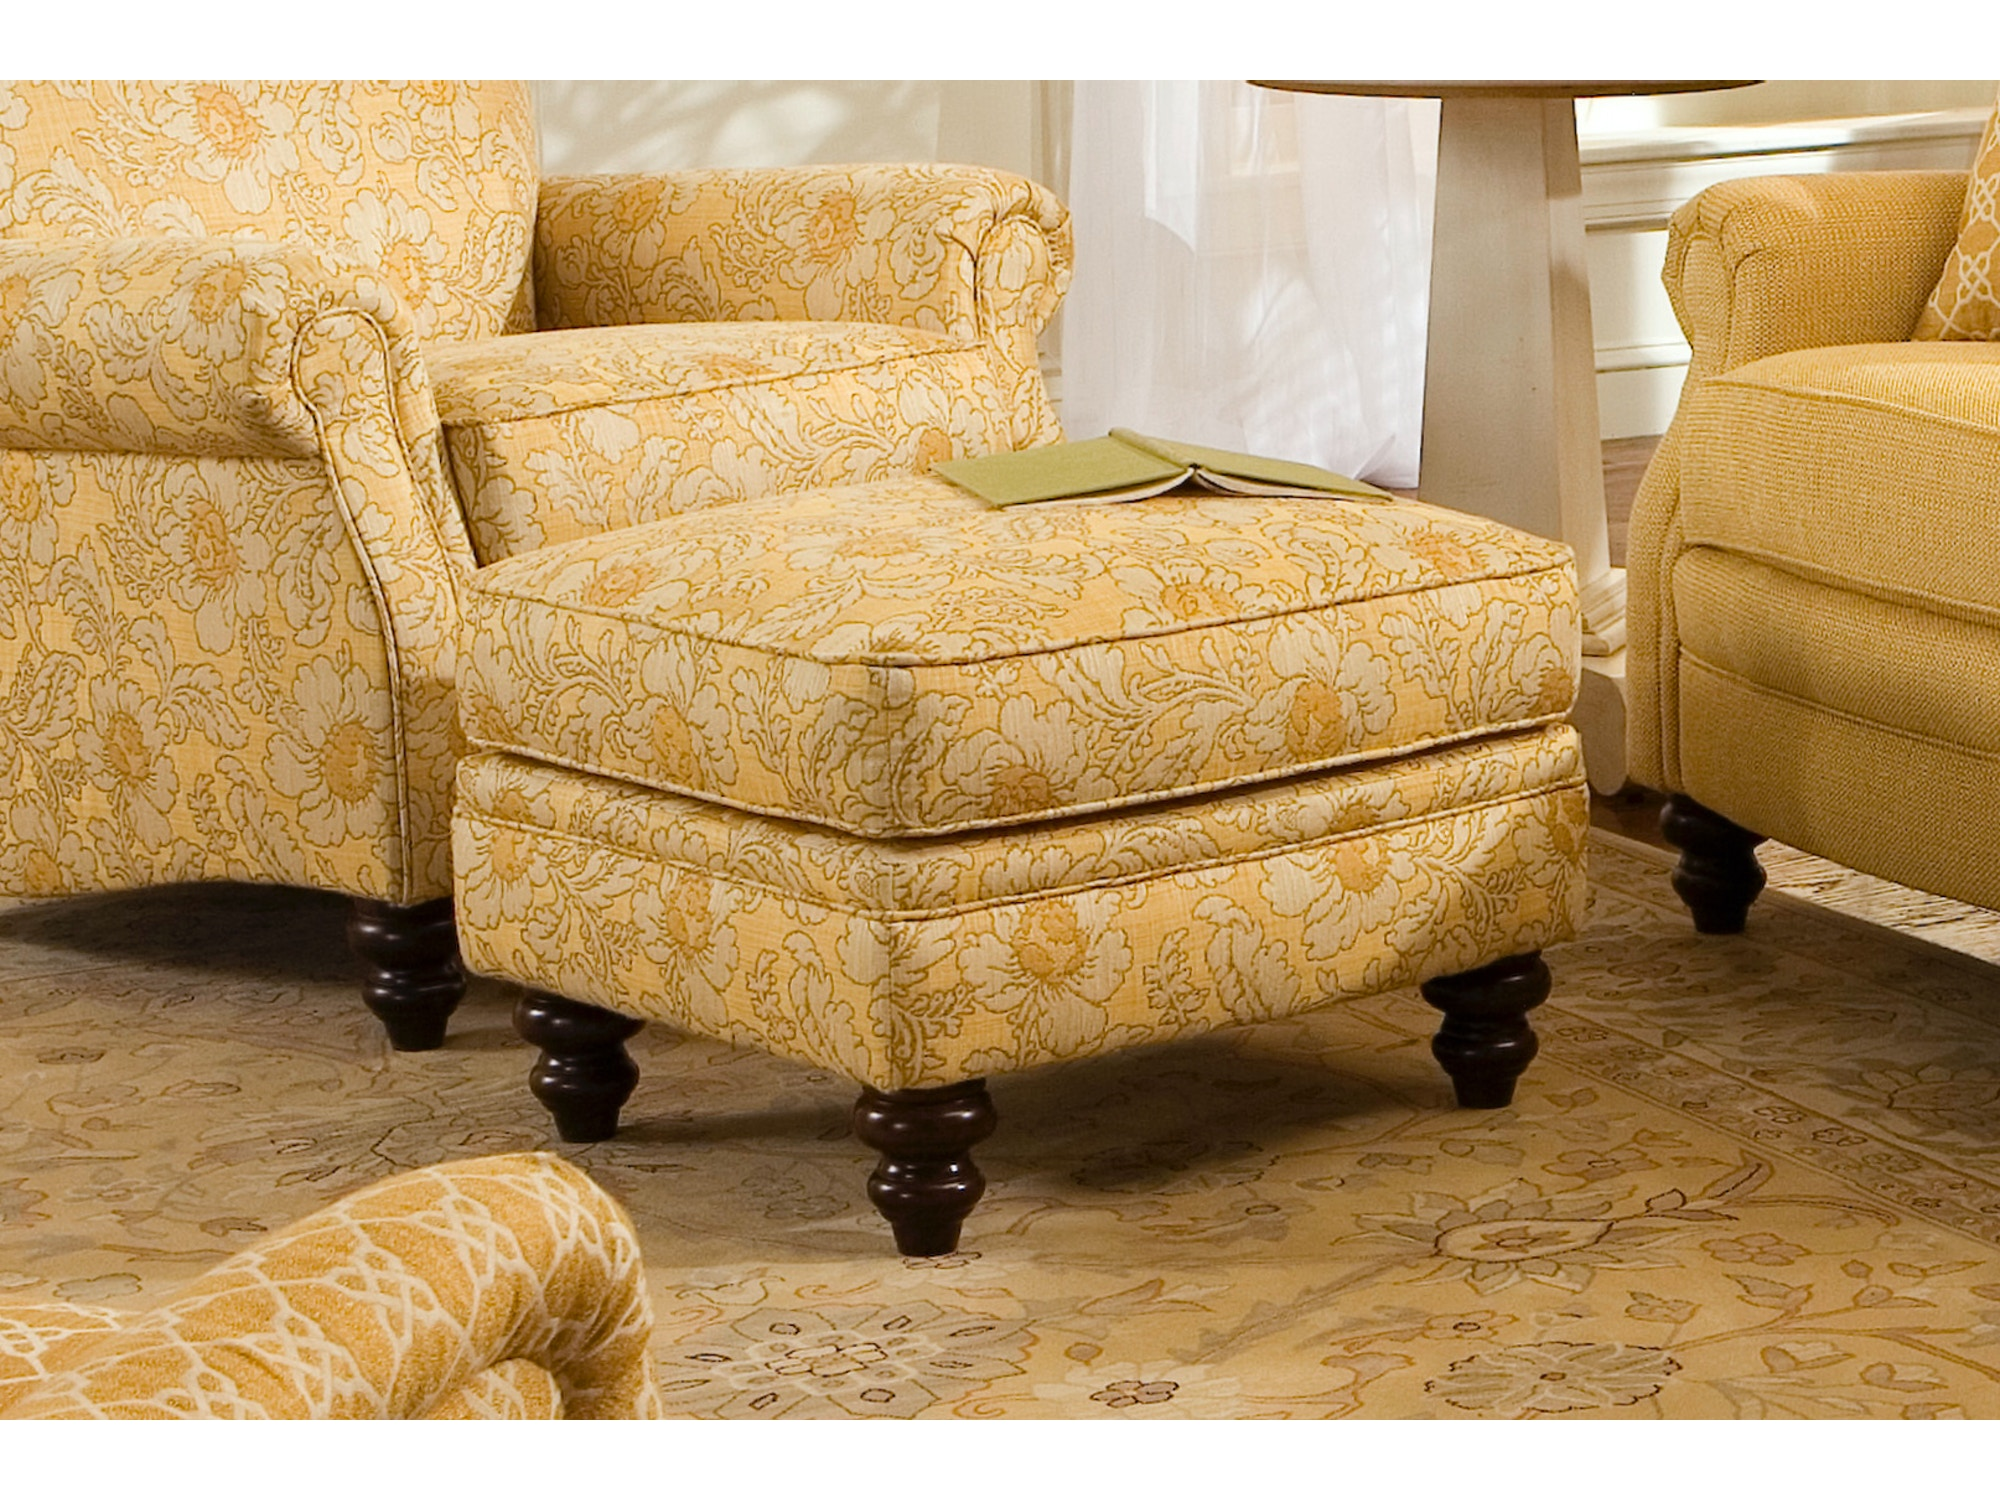 Living Room Ottomans - Furniture Fair - Cincinnati & Dayton OH and ...